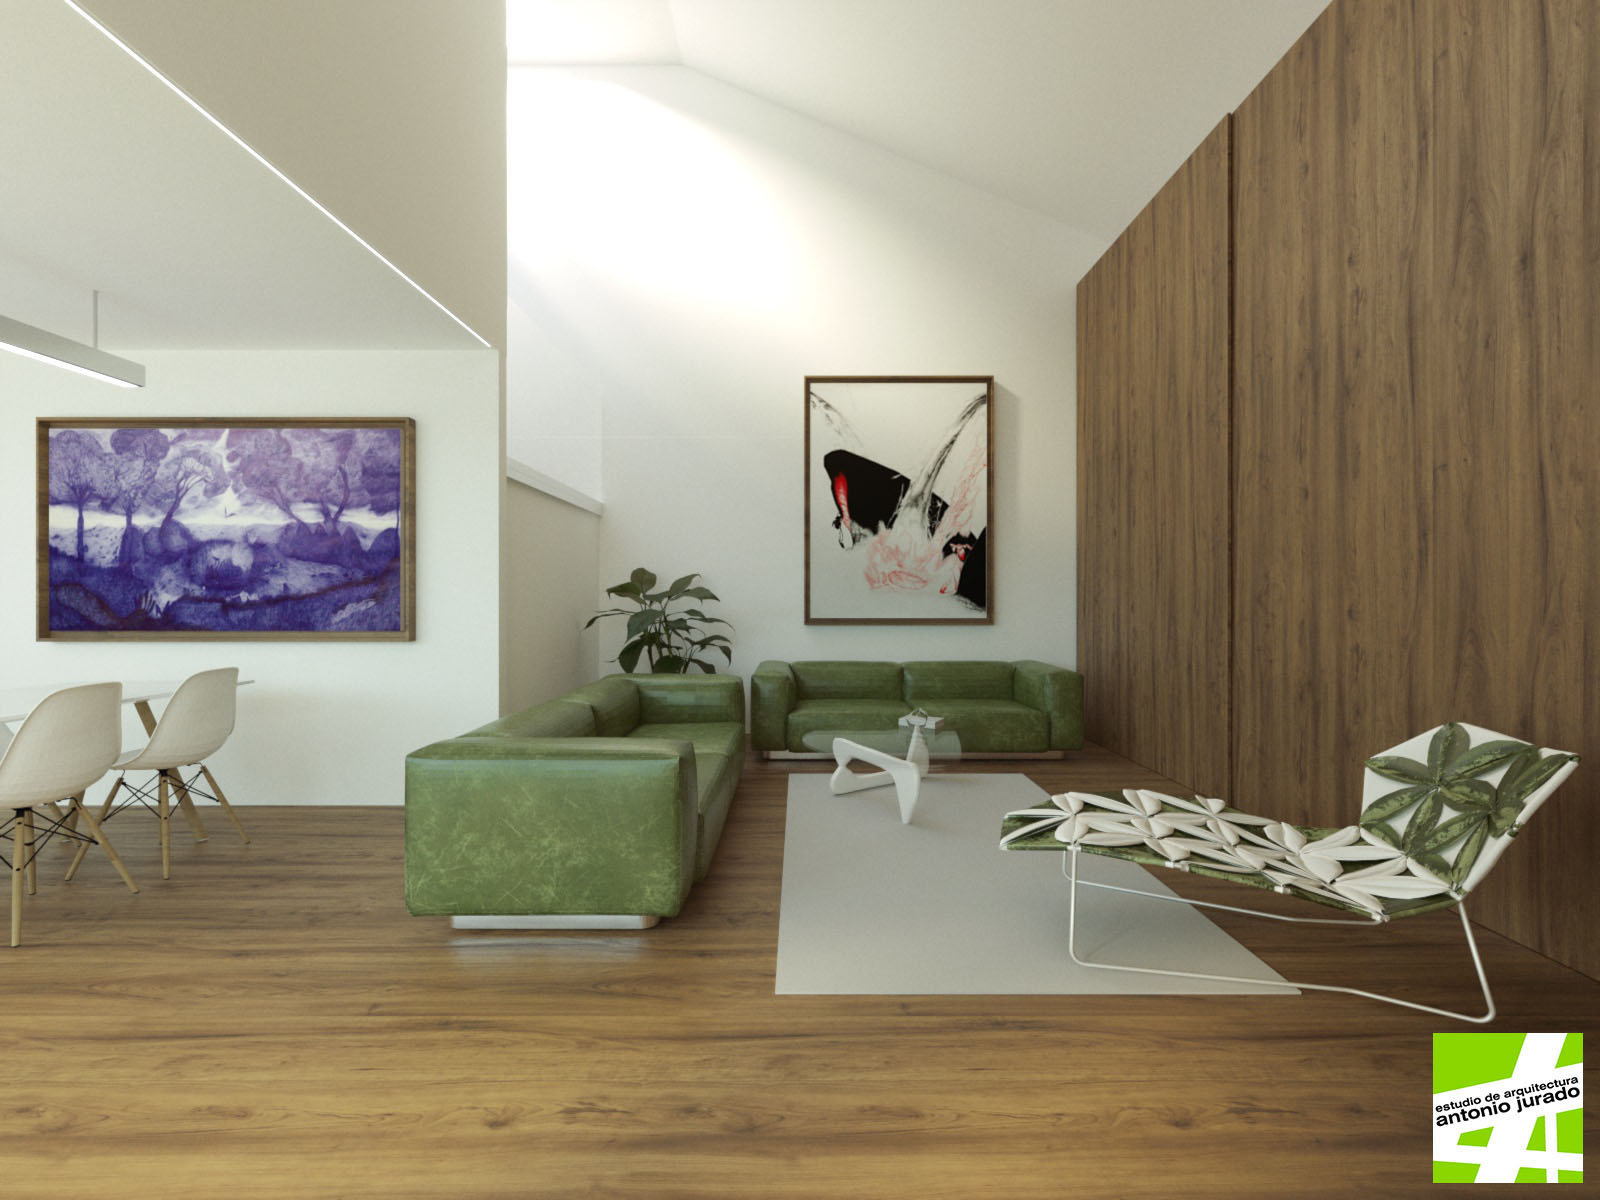 casa-ob-house-alhaurin-malaga-arquitecto-antonio-jurado-05